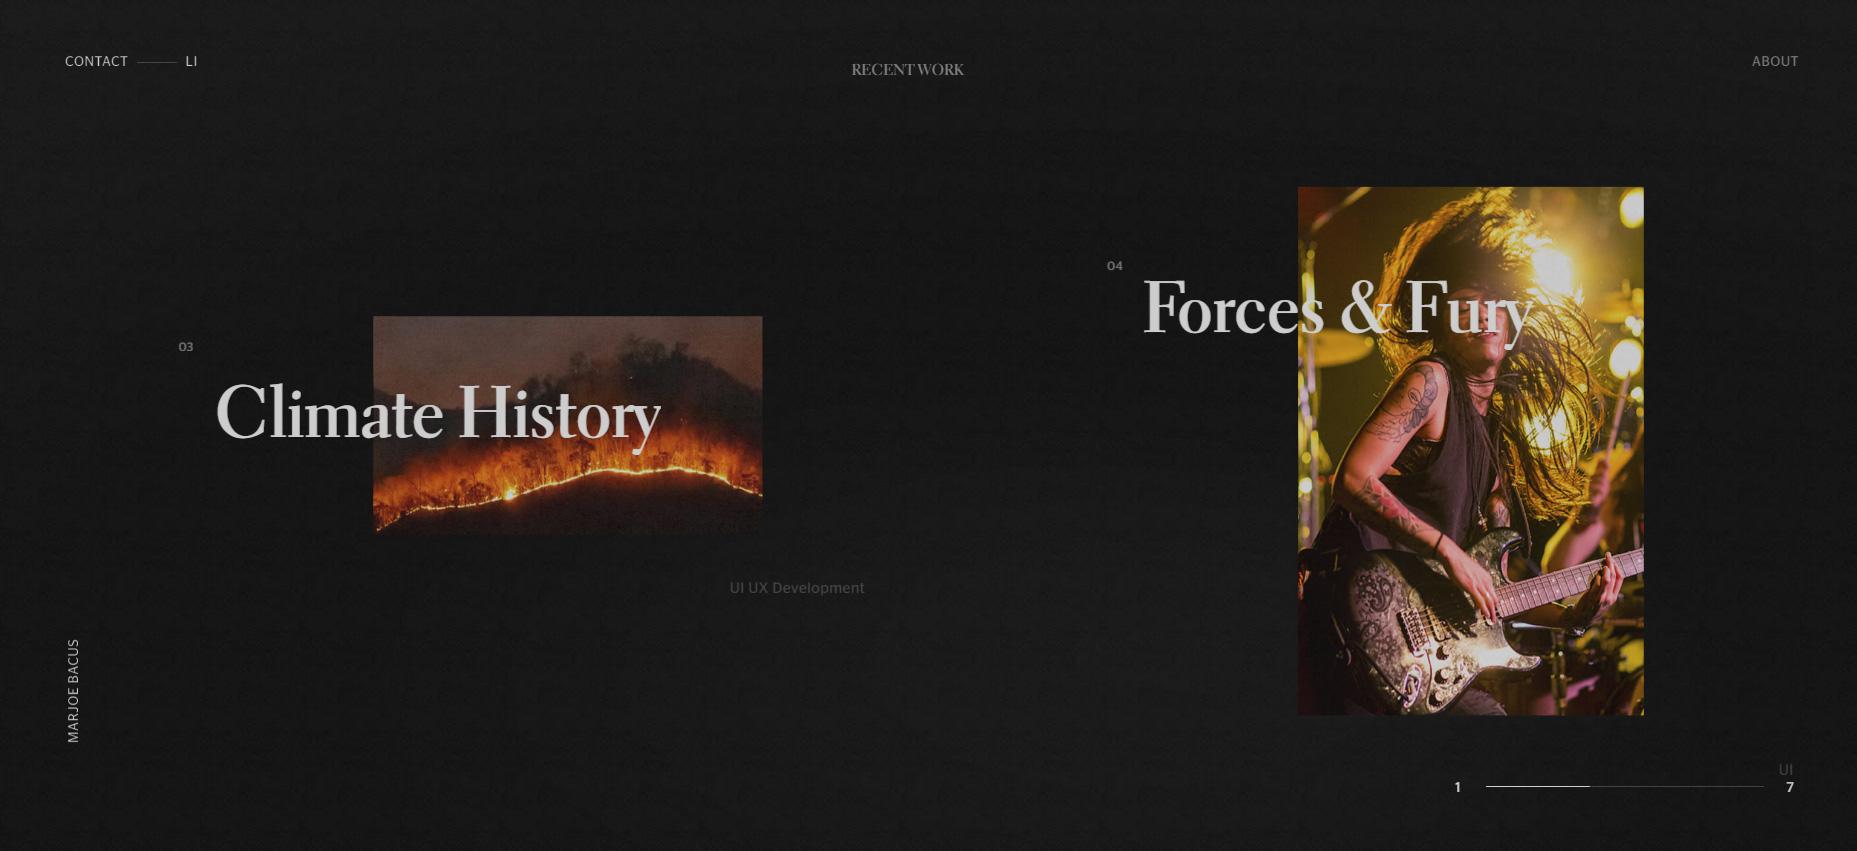 Marjoe Bacus 2020 Portfolio - Website of the Day